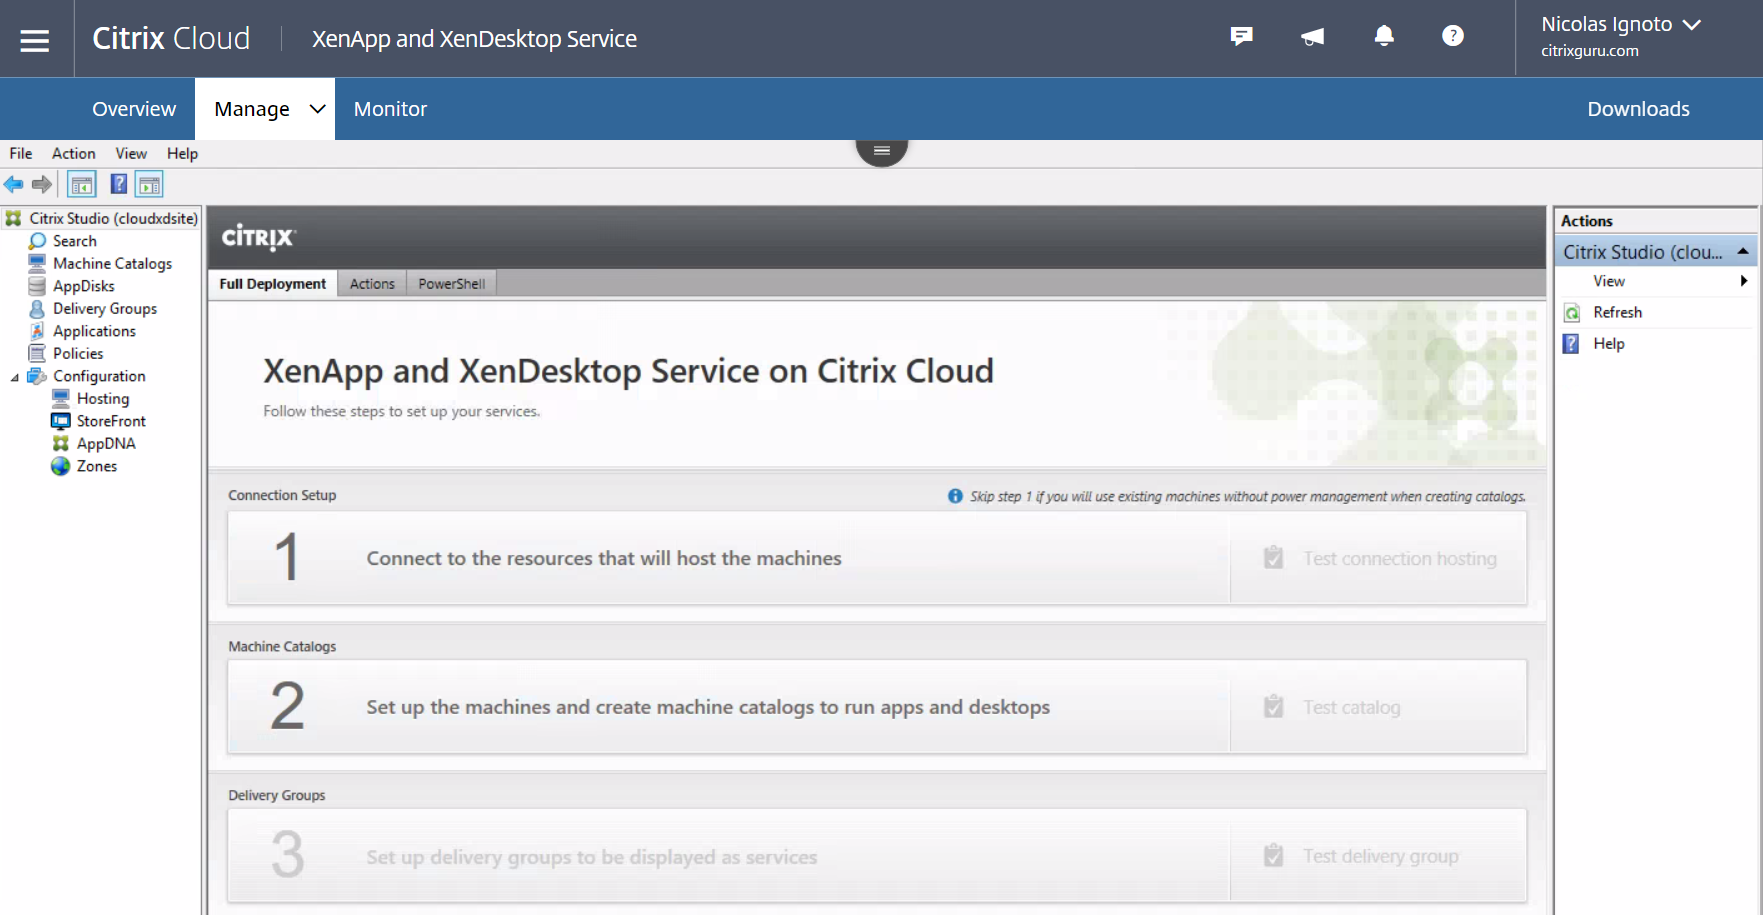 XenDesktop and XenApp Service Console